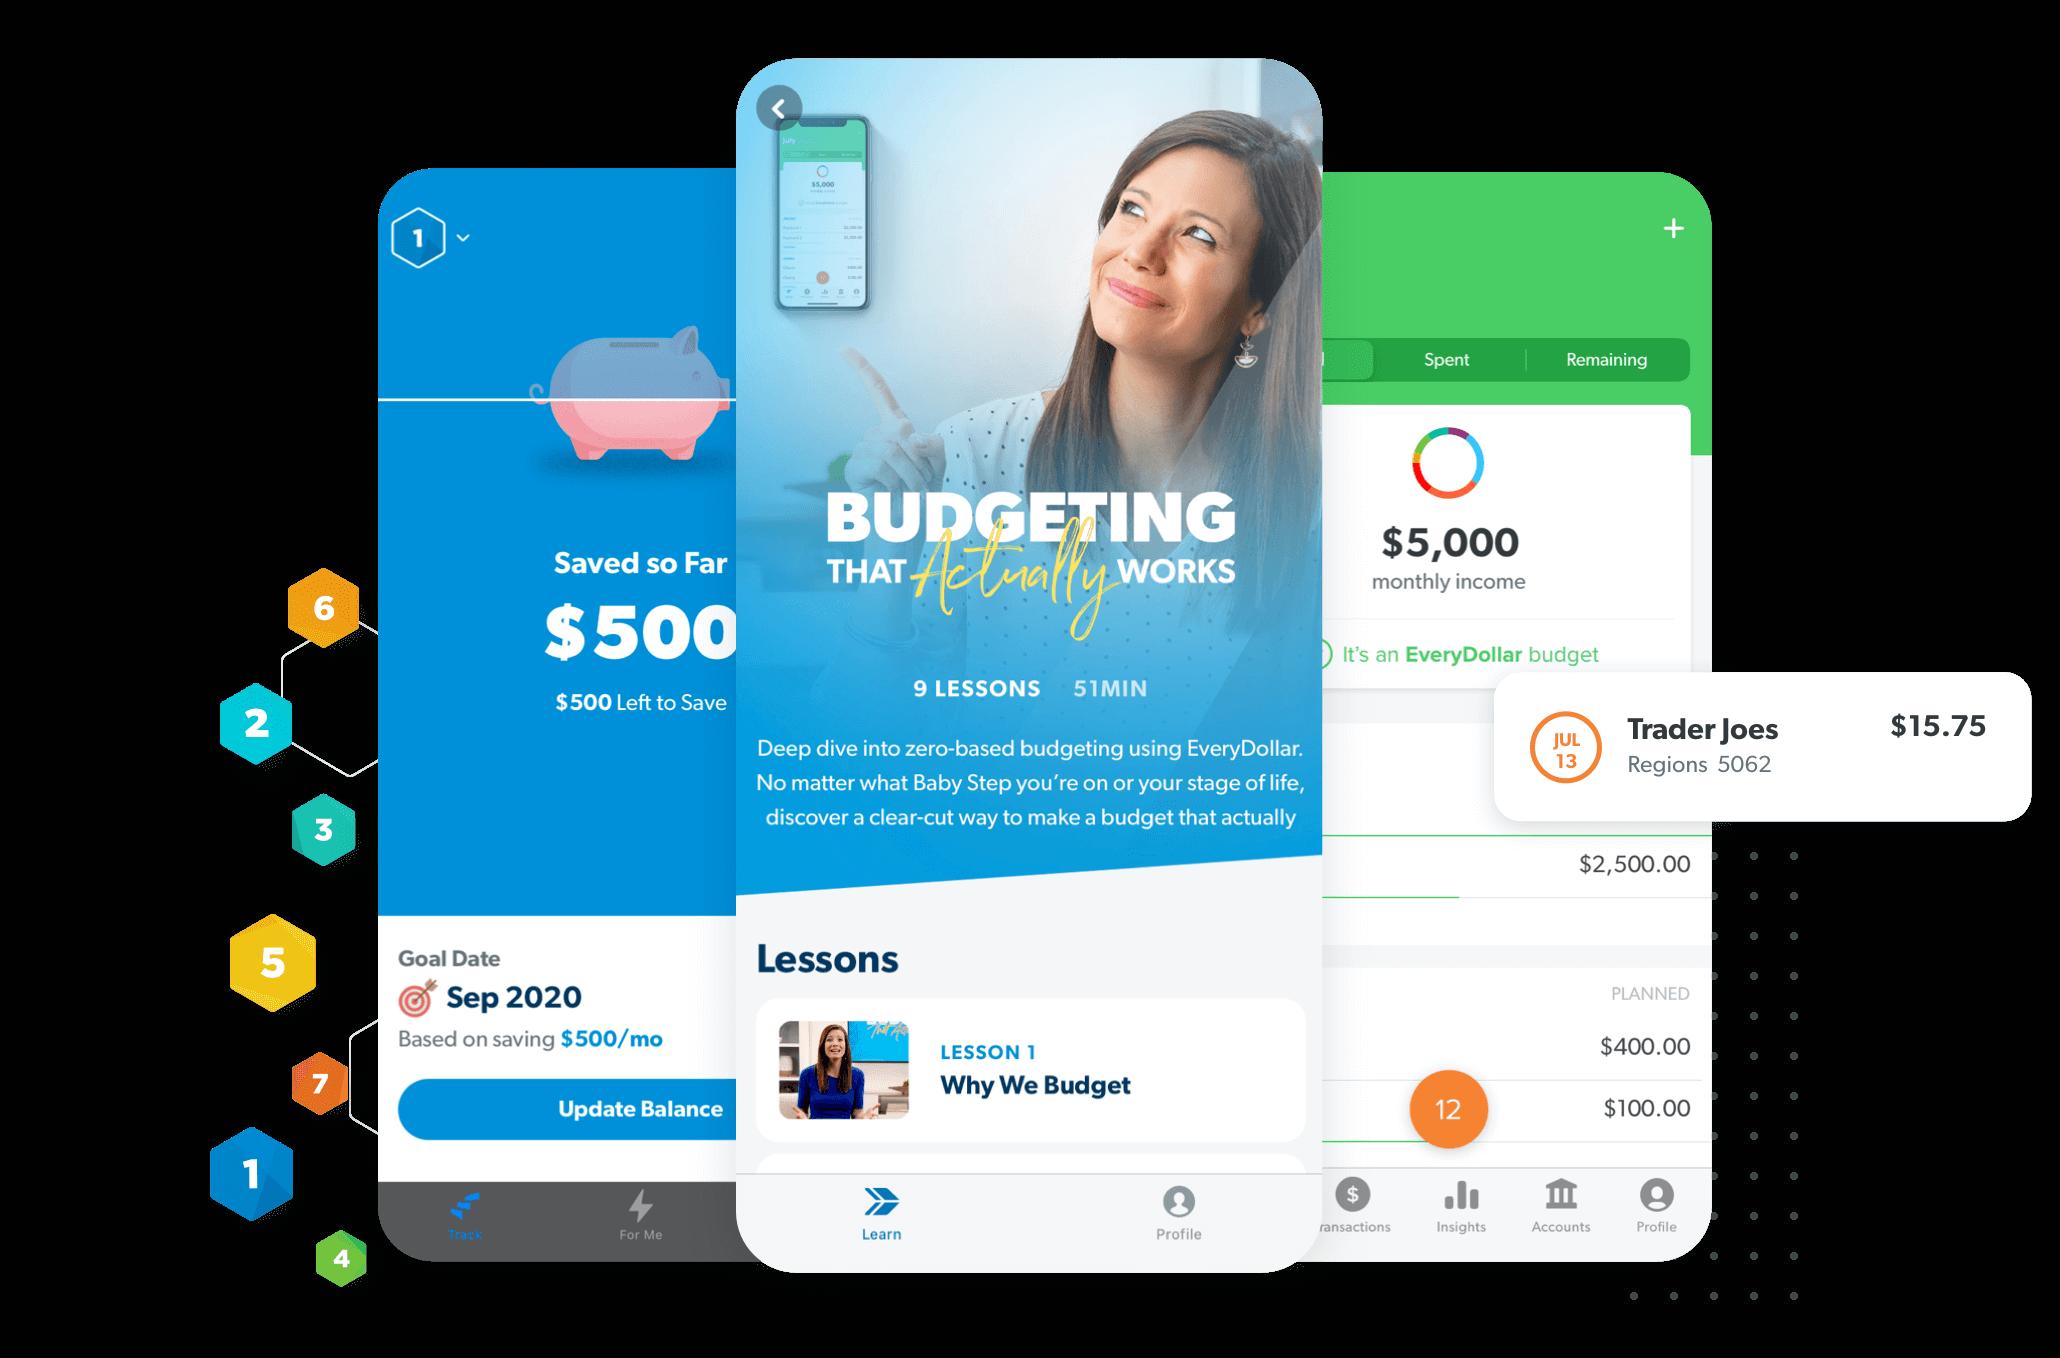 Baby Steps App, Learn App, EveryDollar App